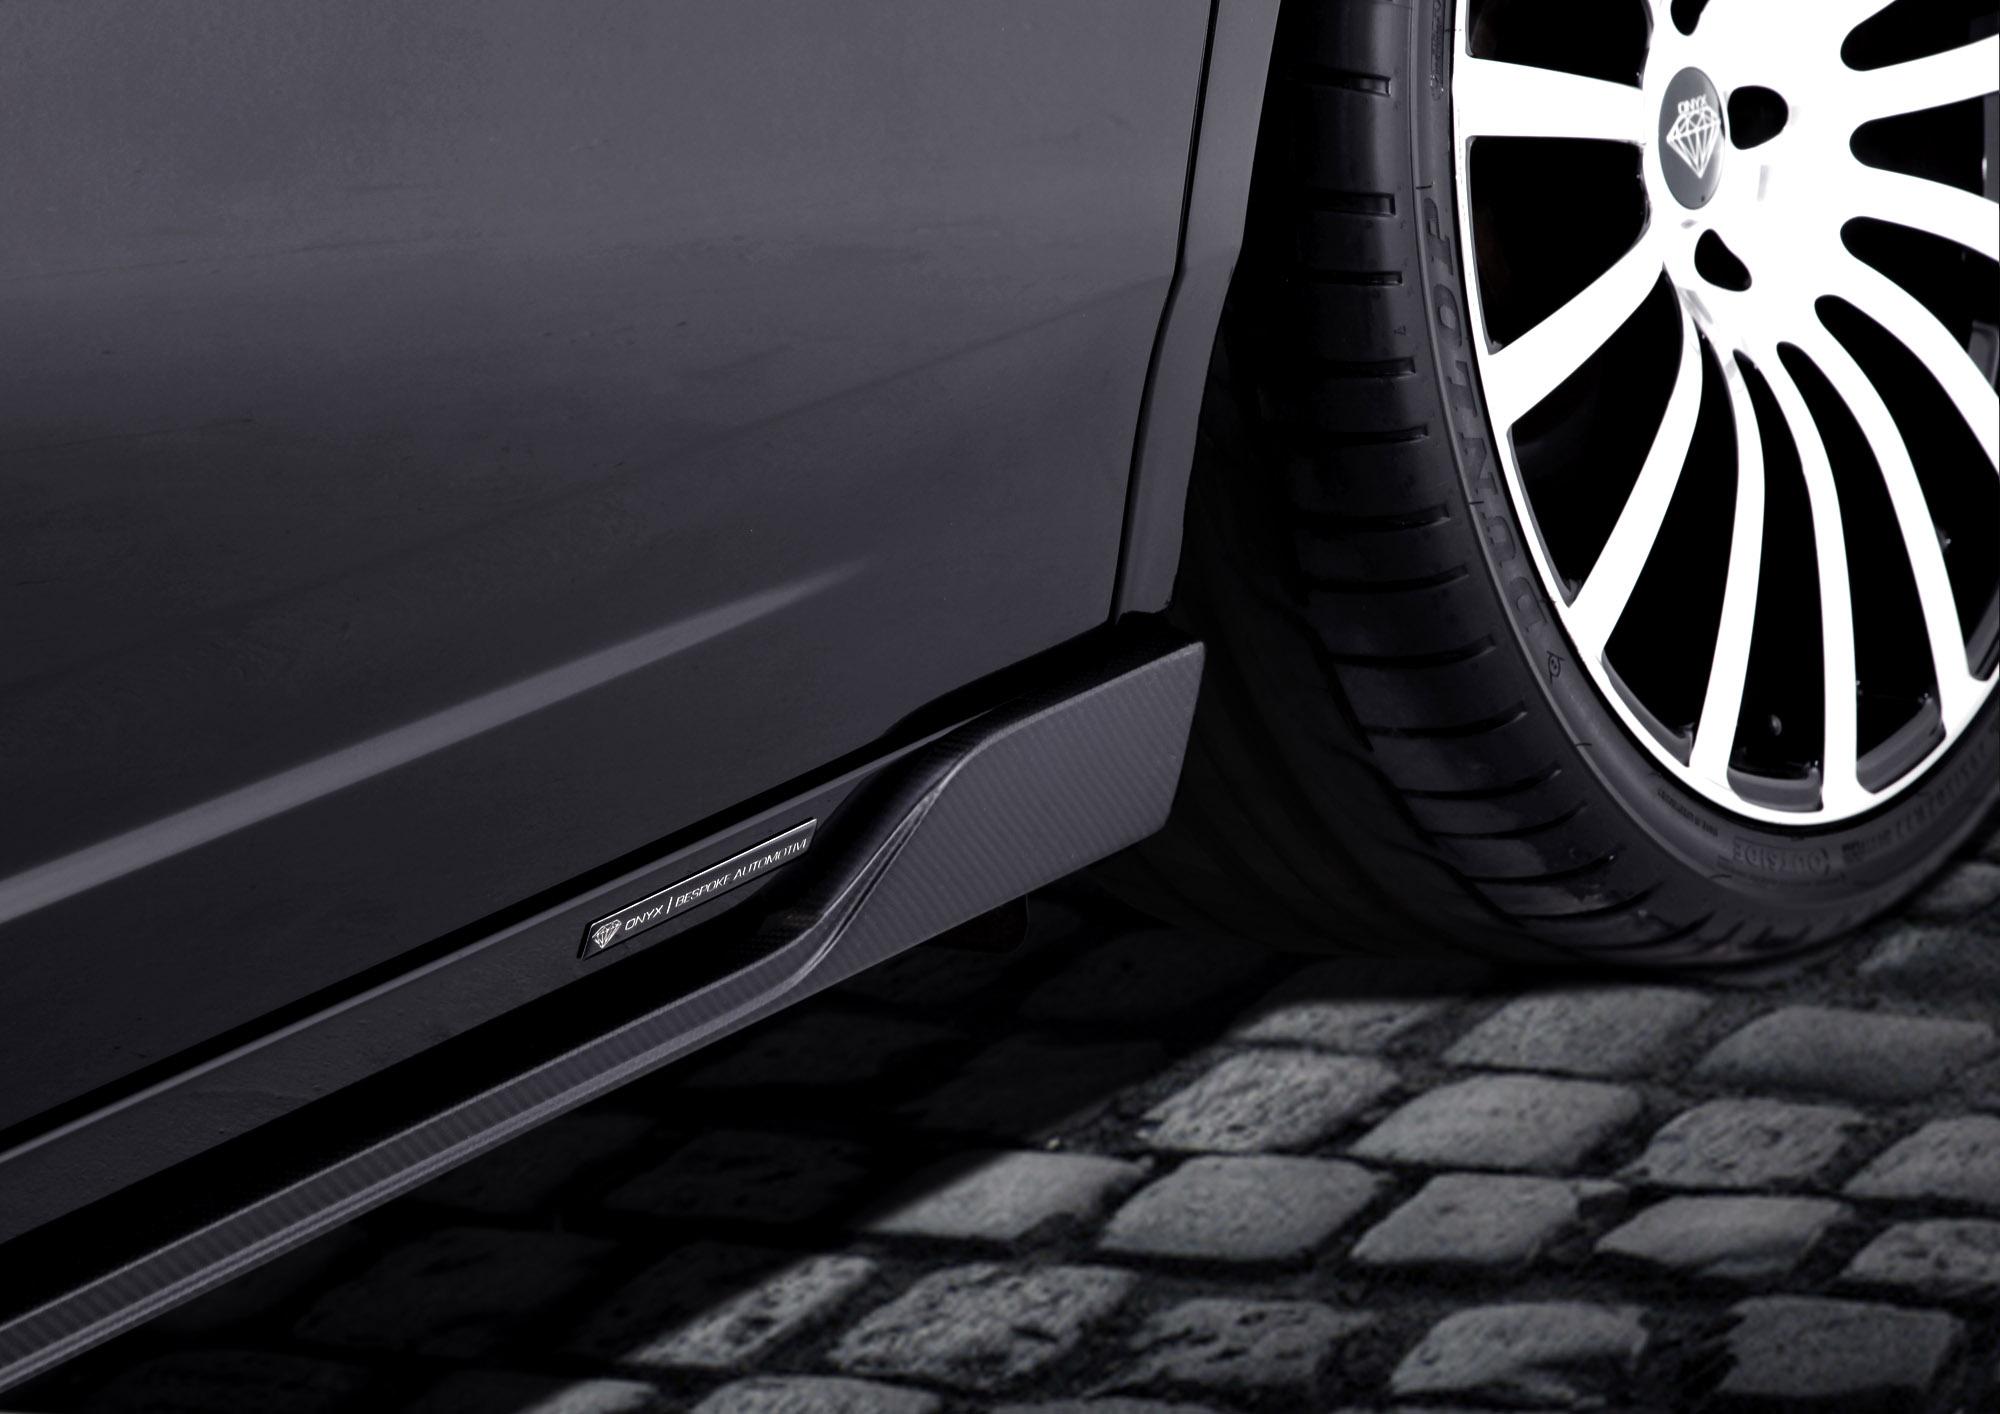 2015 Onyx Rolls-Royce Ghost San Mortiz